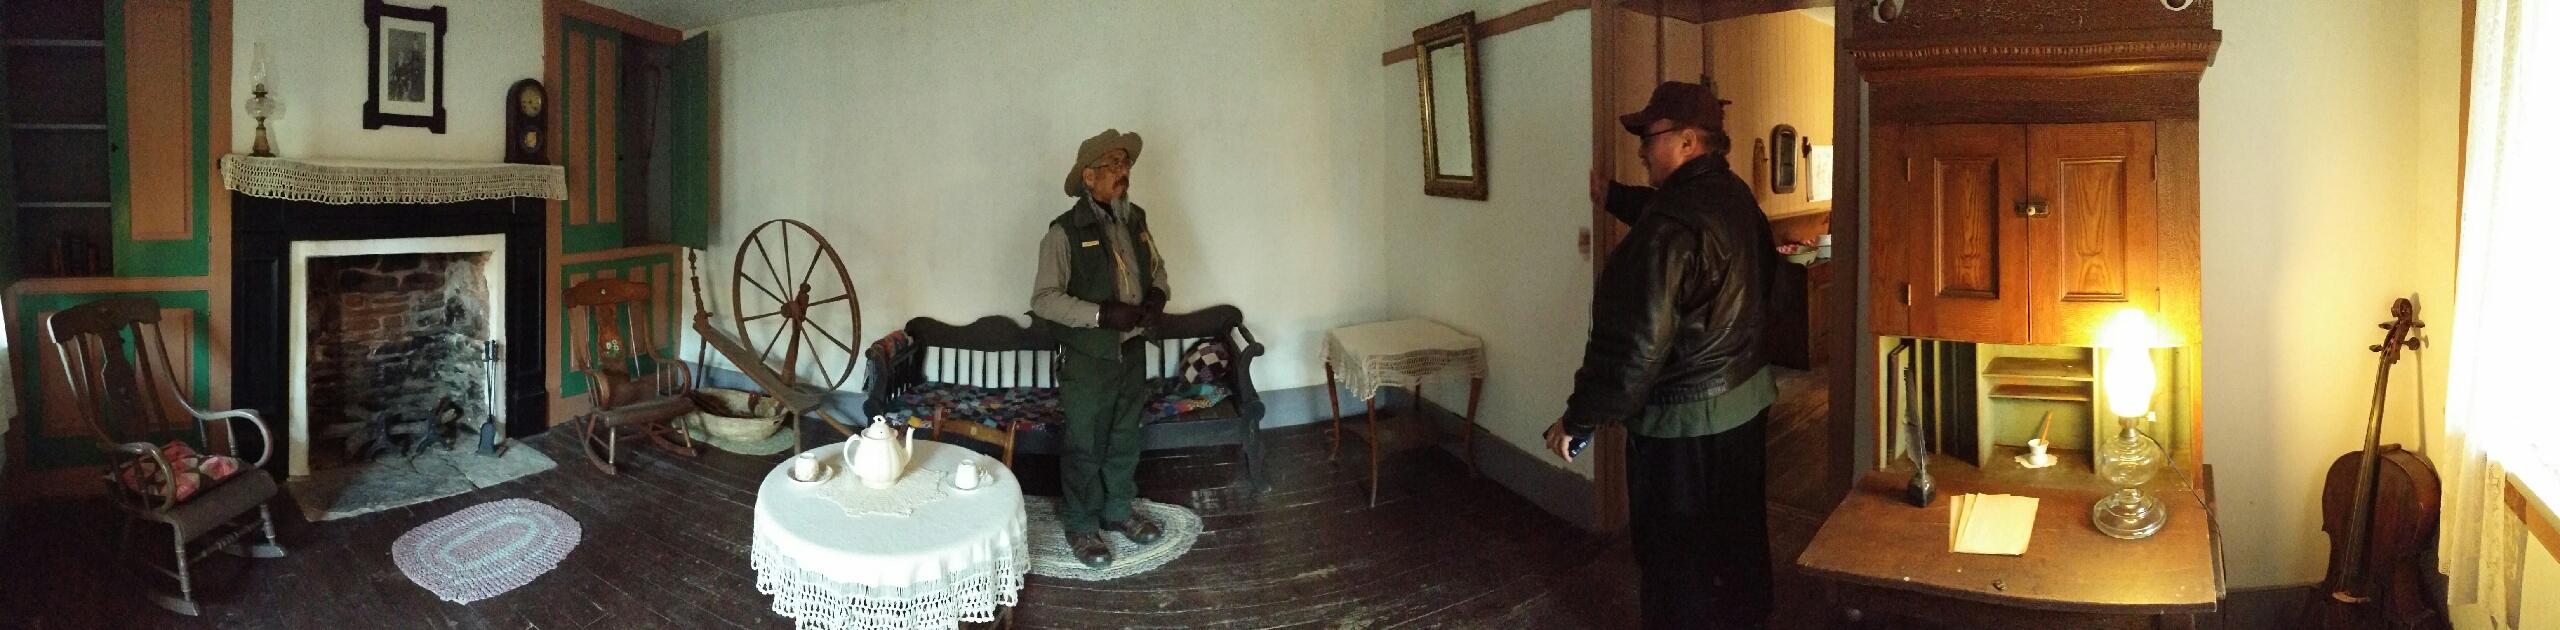 Old Fort Noah's trip14